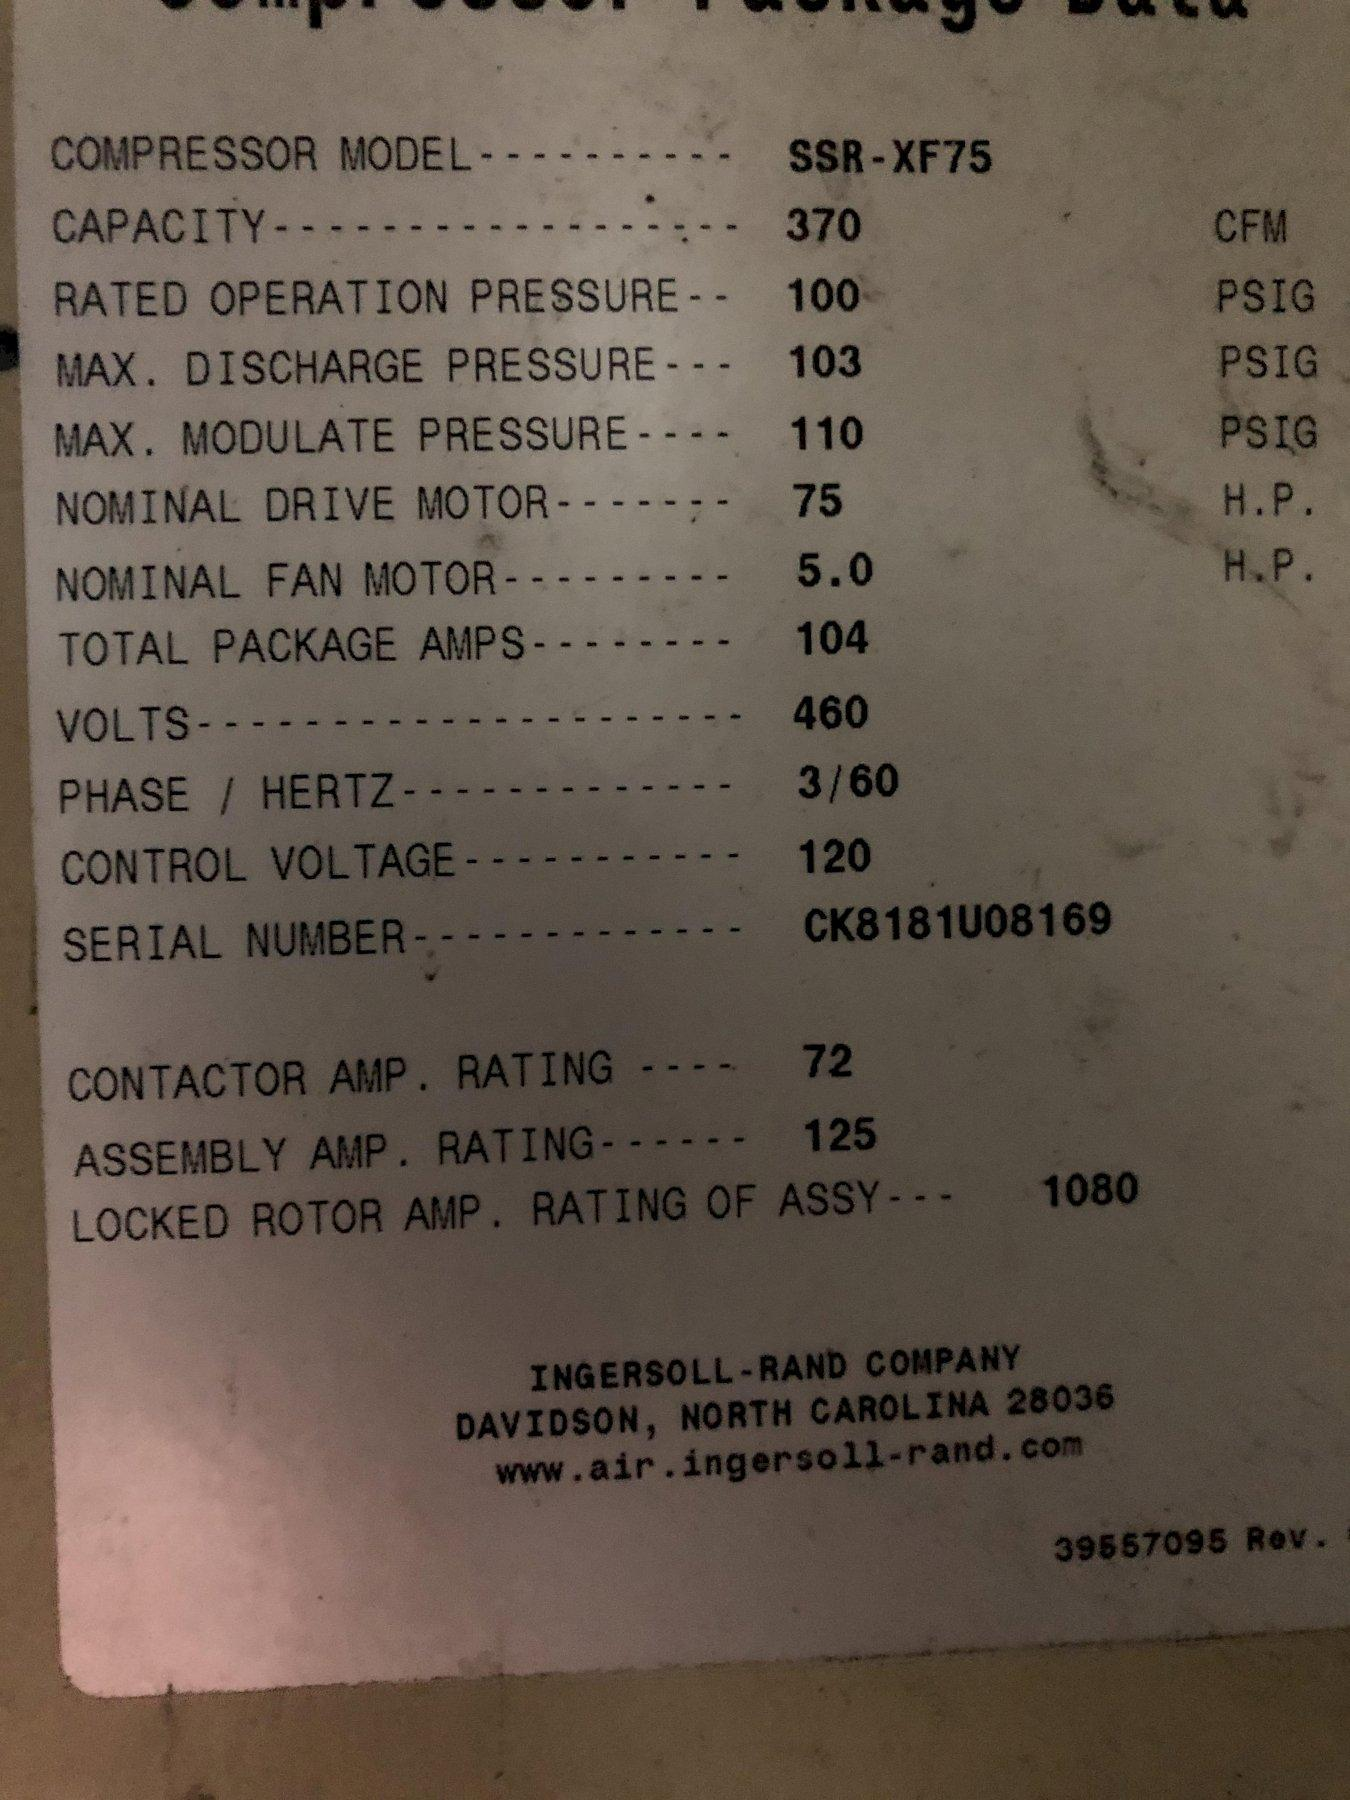 2008 Ingersol Rand model ssr-xf75 screw type air compressor s/n ck8181u08169, digital readout